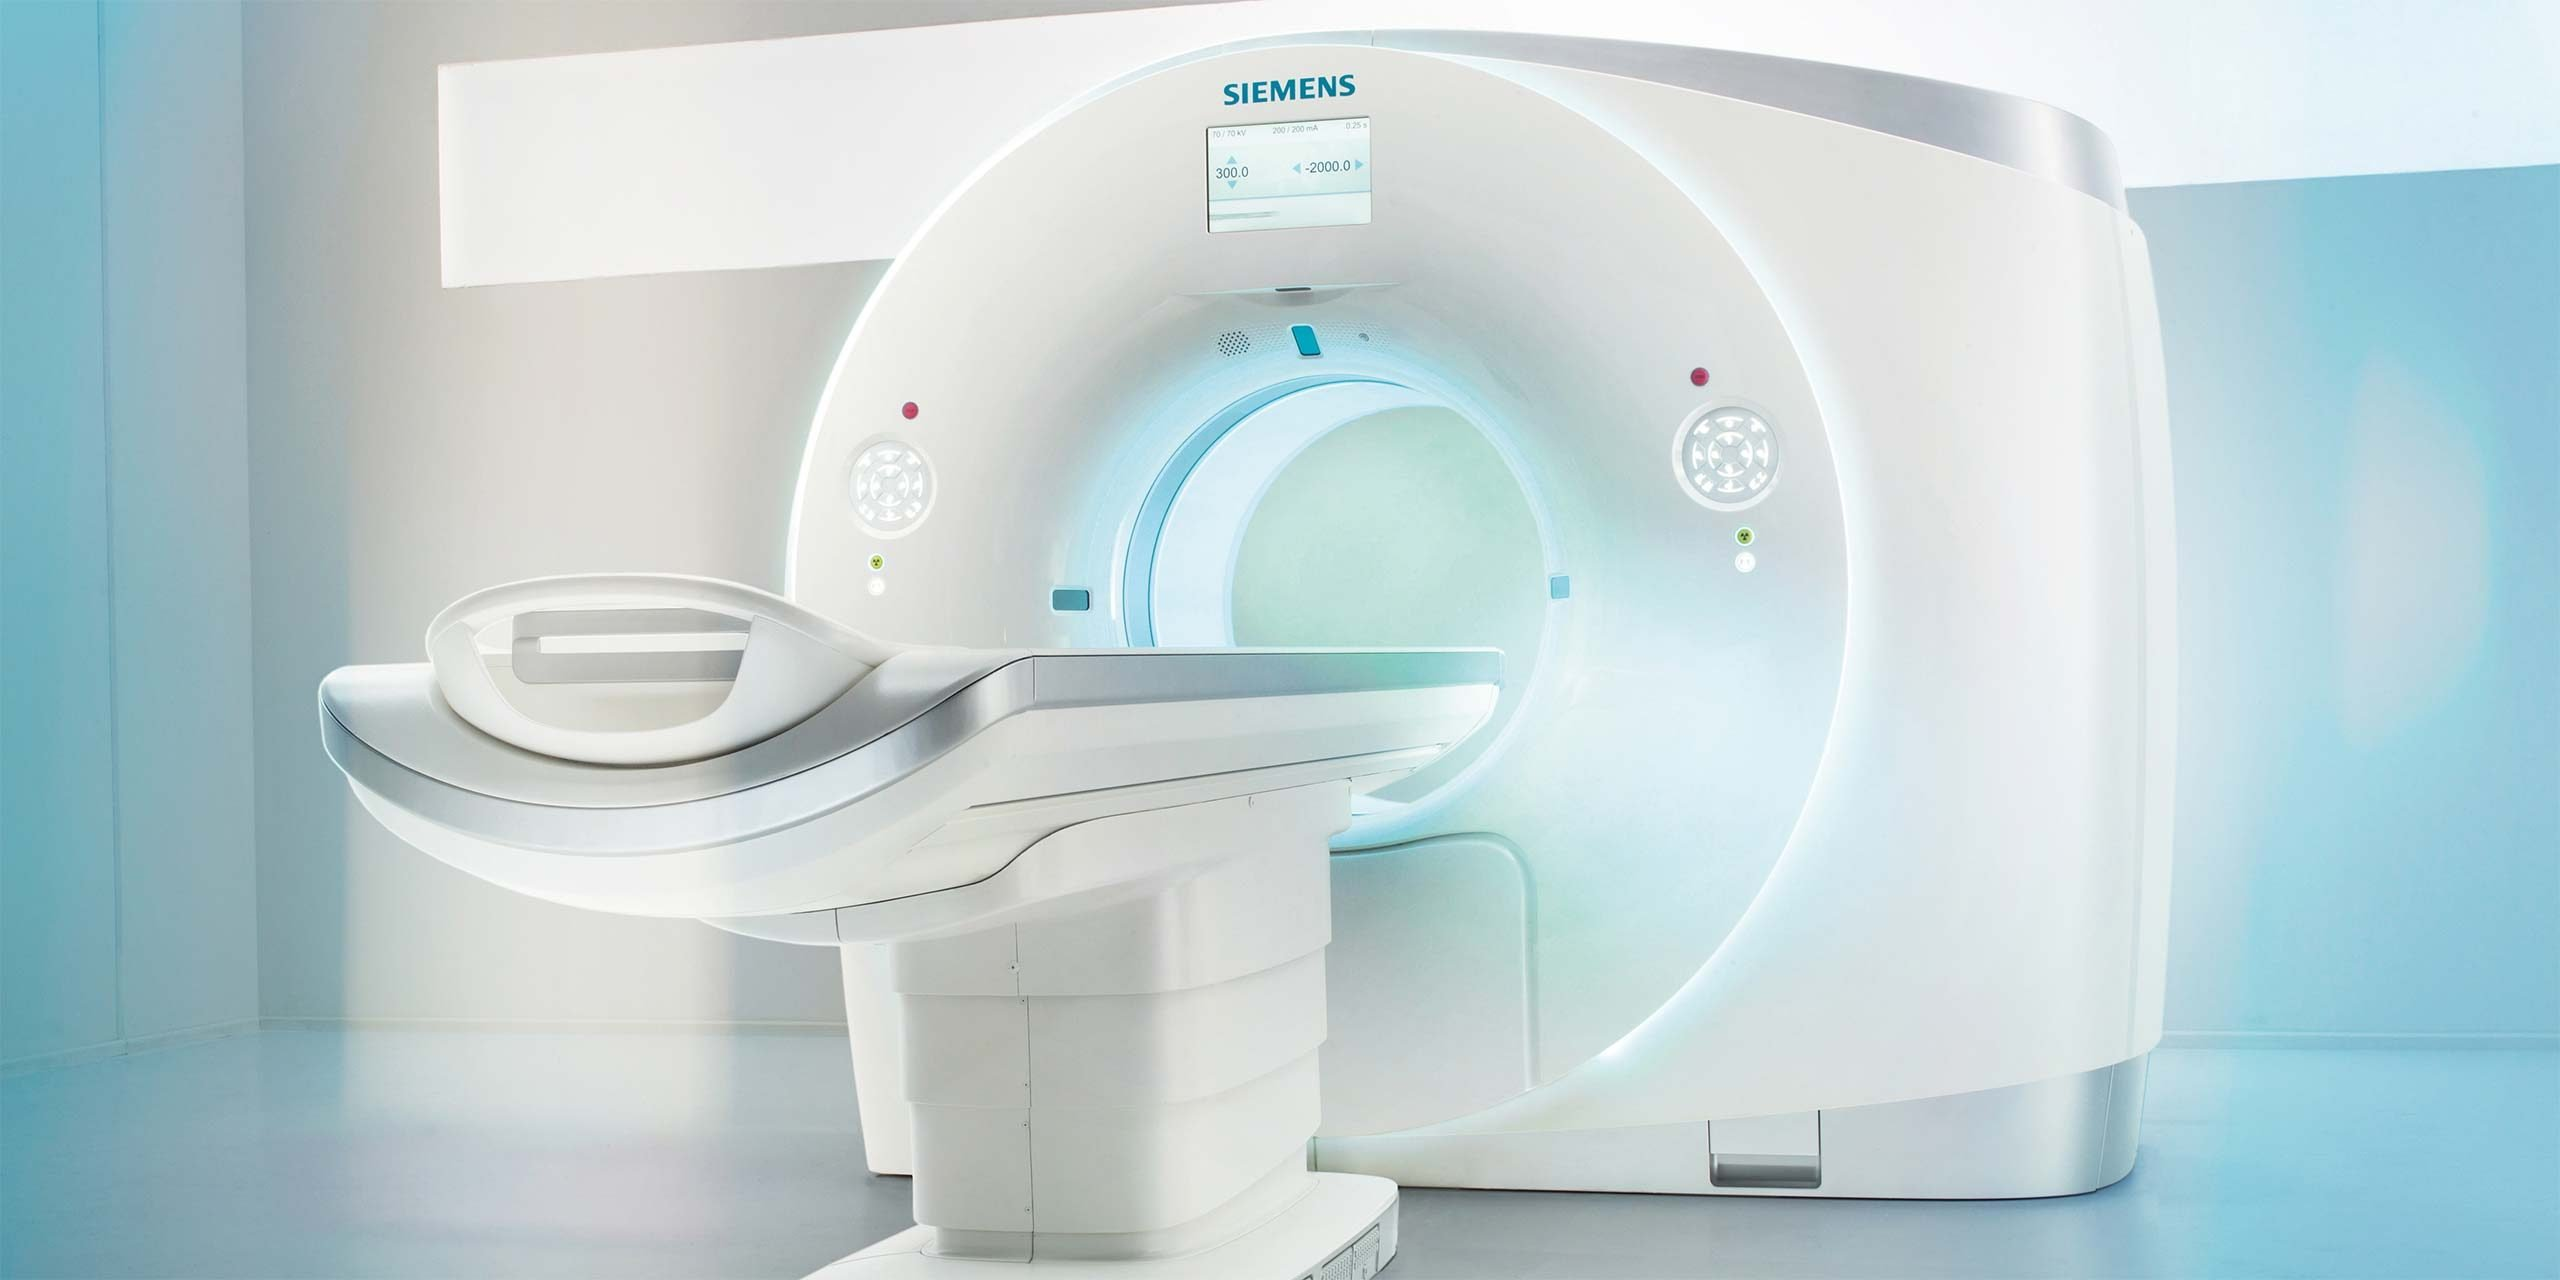 Radiologikum - Eppendorfer-Baum - Nuklearmedizin